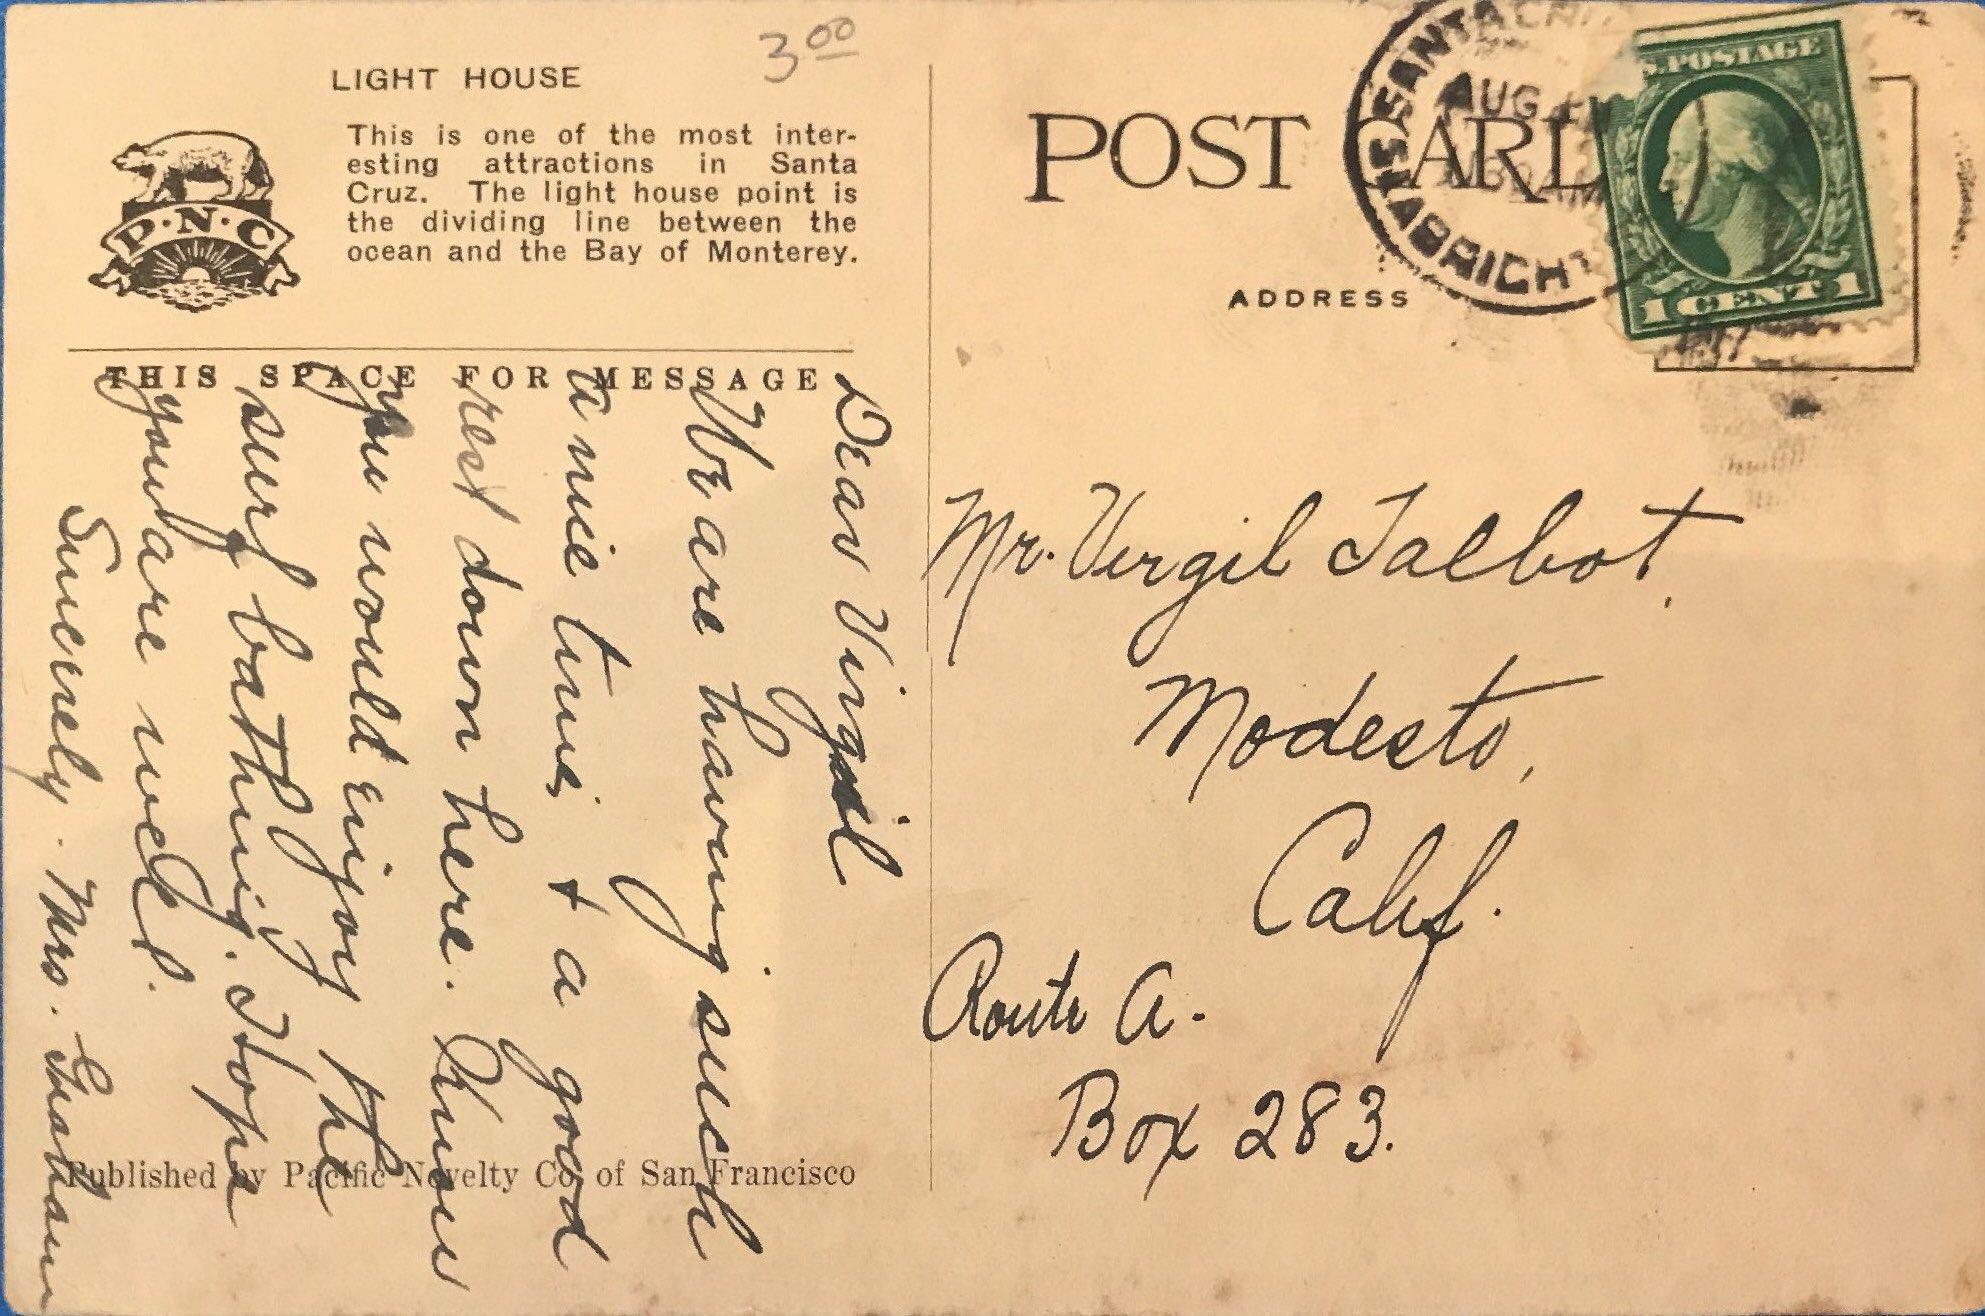 Light House Postcard Back